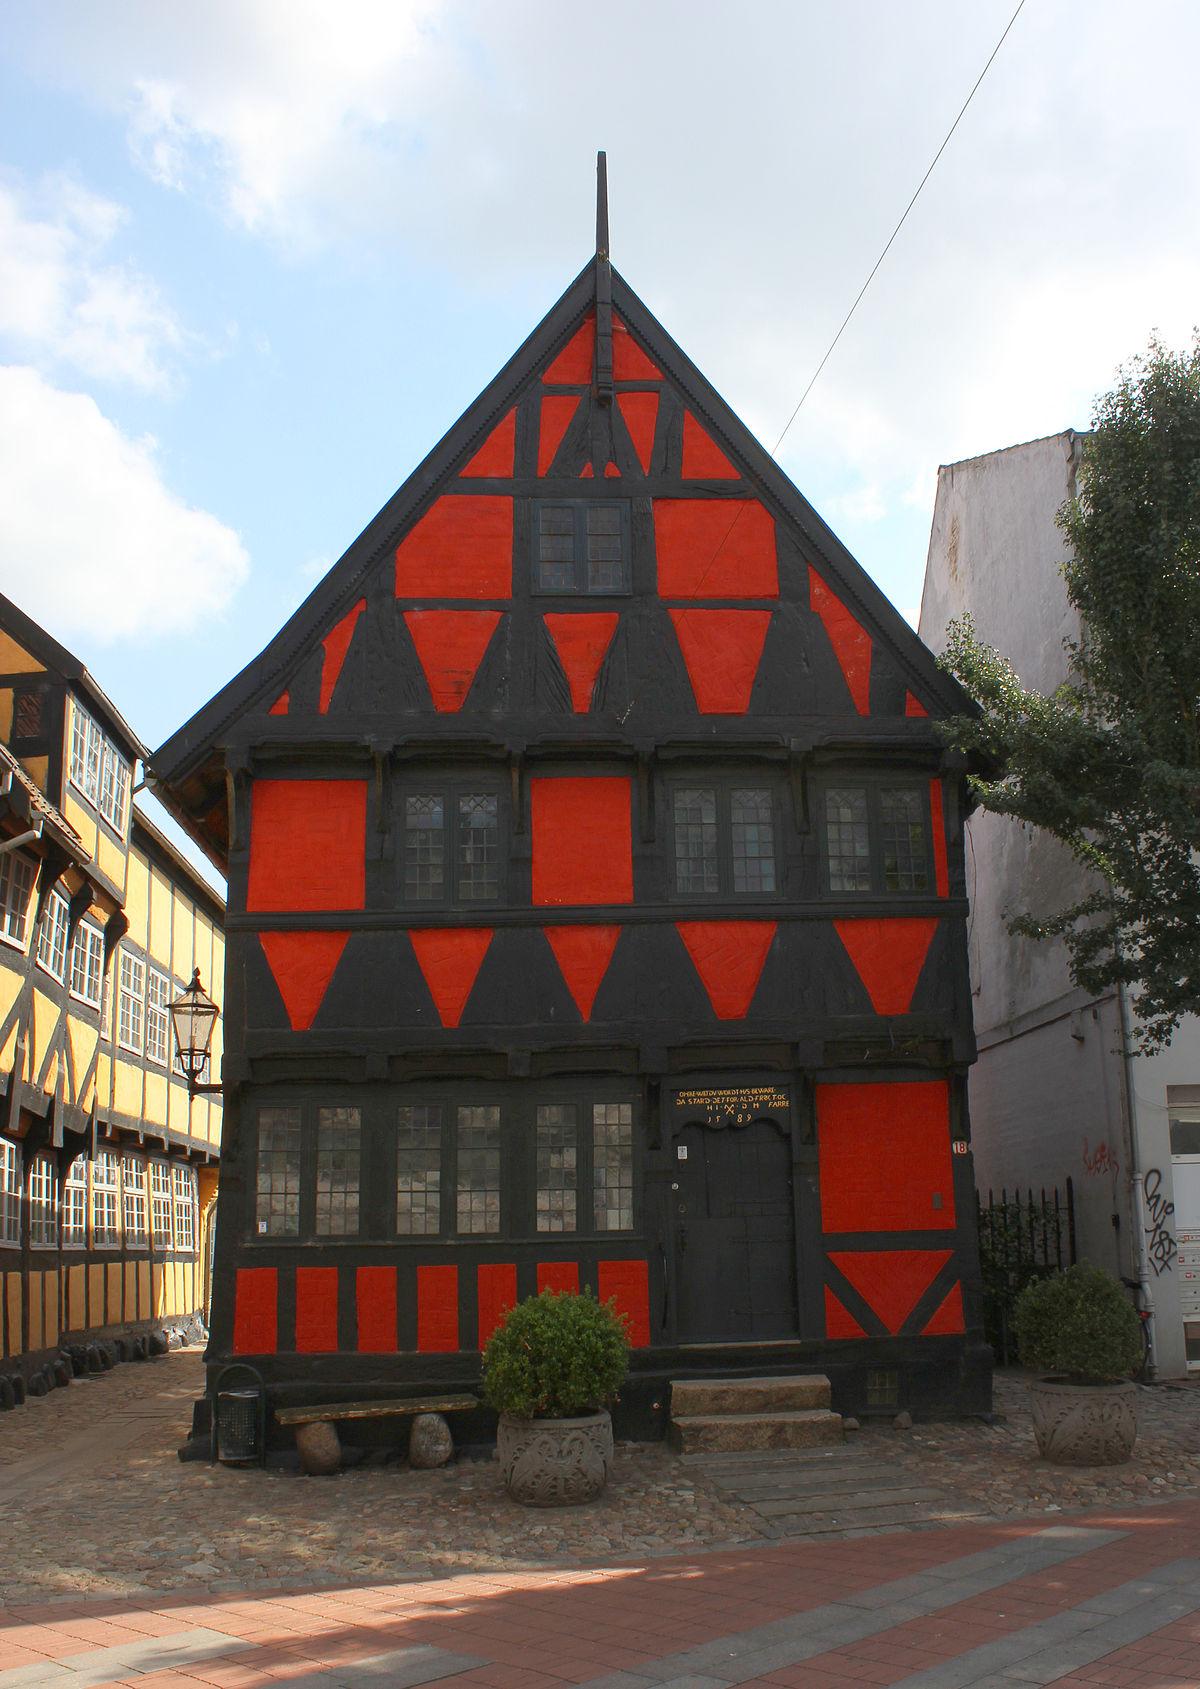 Det gamle borgerhus - Wikipedia, den frie encyklopædi